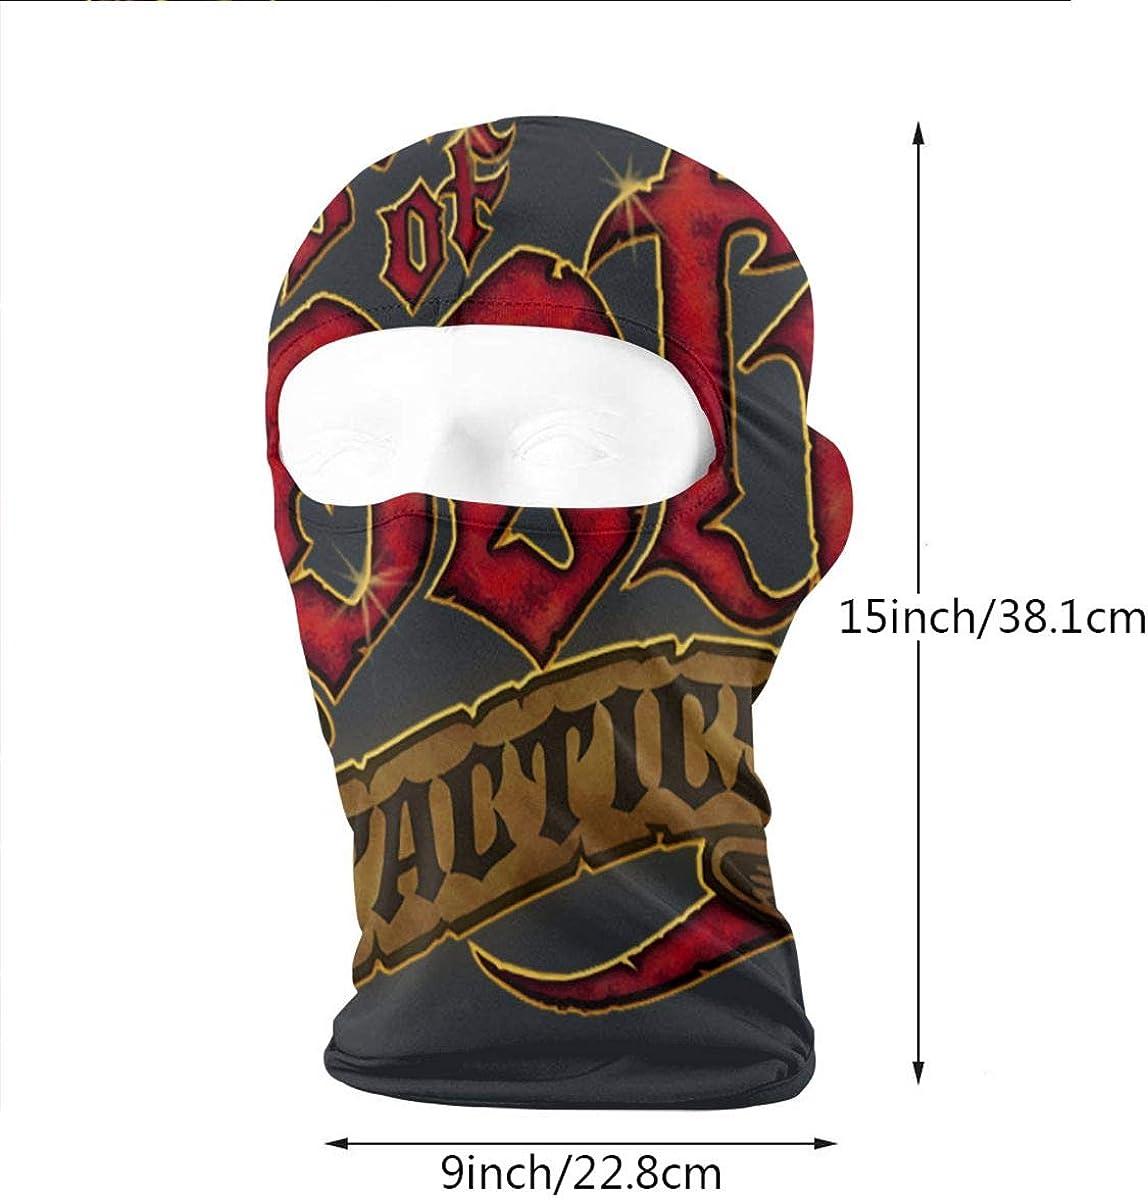 Bone Thugs N Harmony Unisex Comfortable And Breathable Fashionable Outdoor Sun Protection Headband